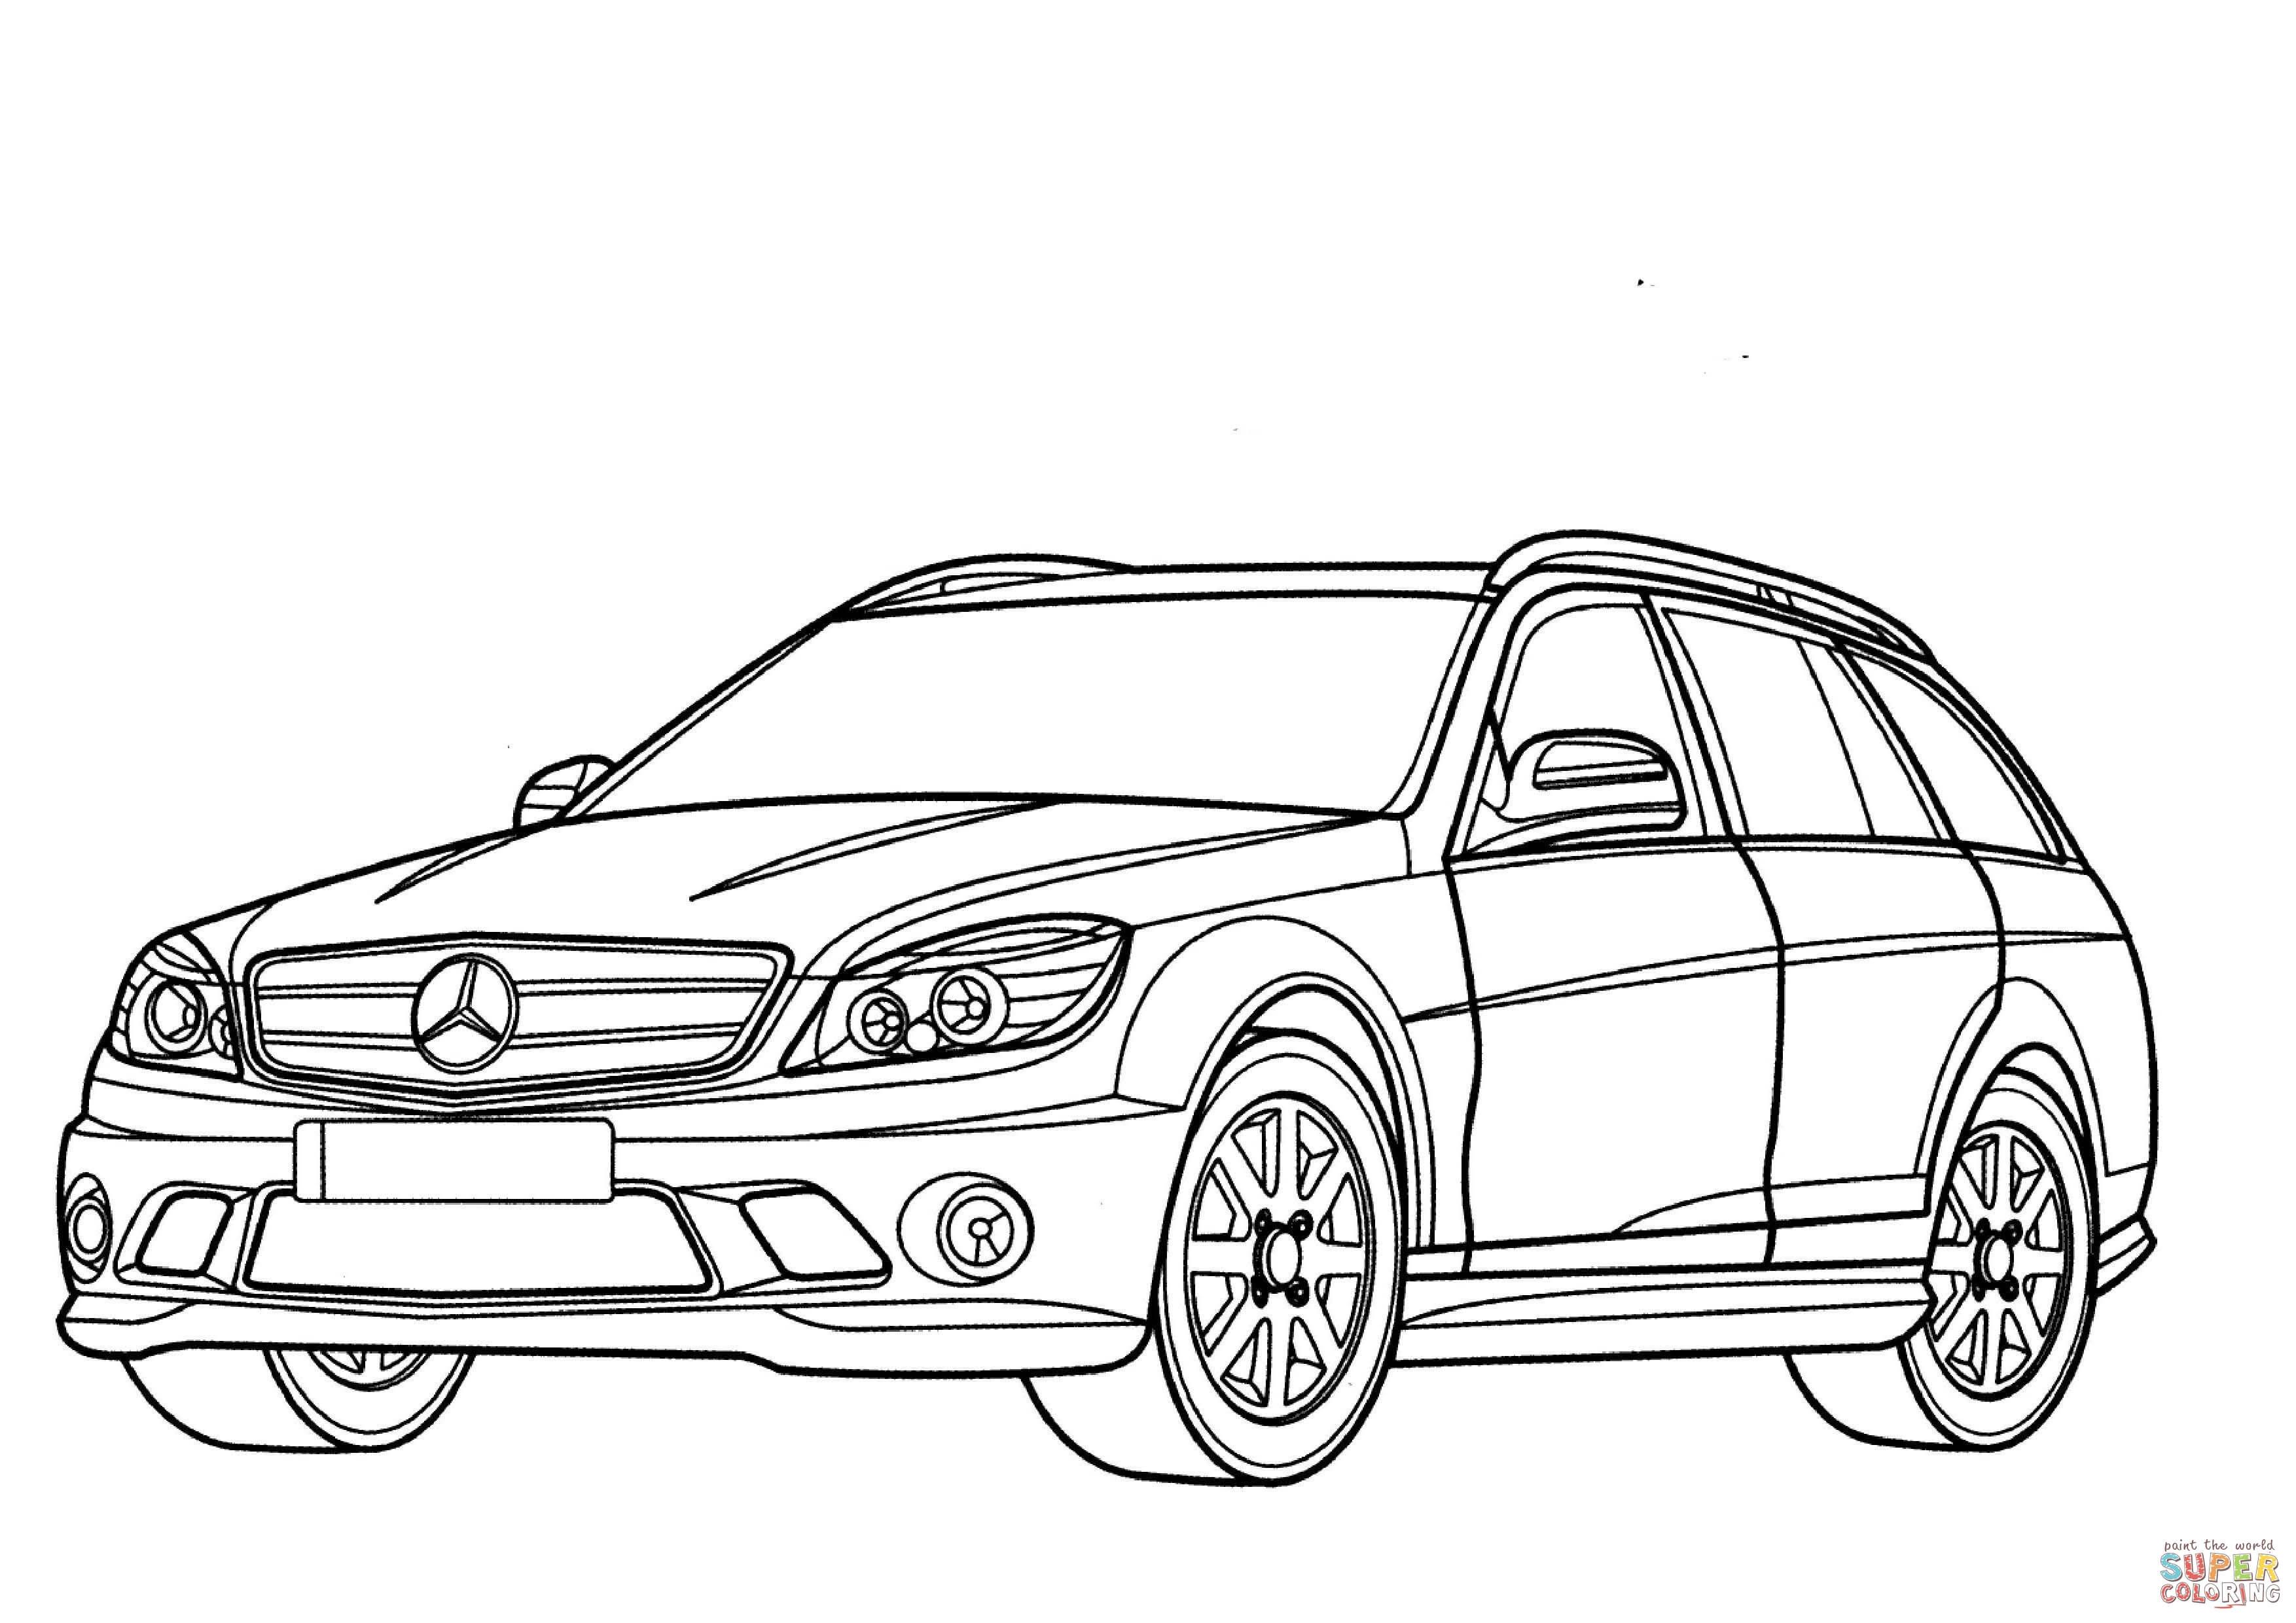 Disegno di Mercedes-Benz Classe C Station Wagon da